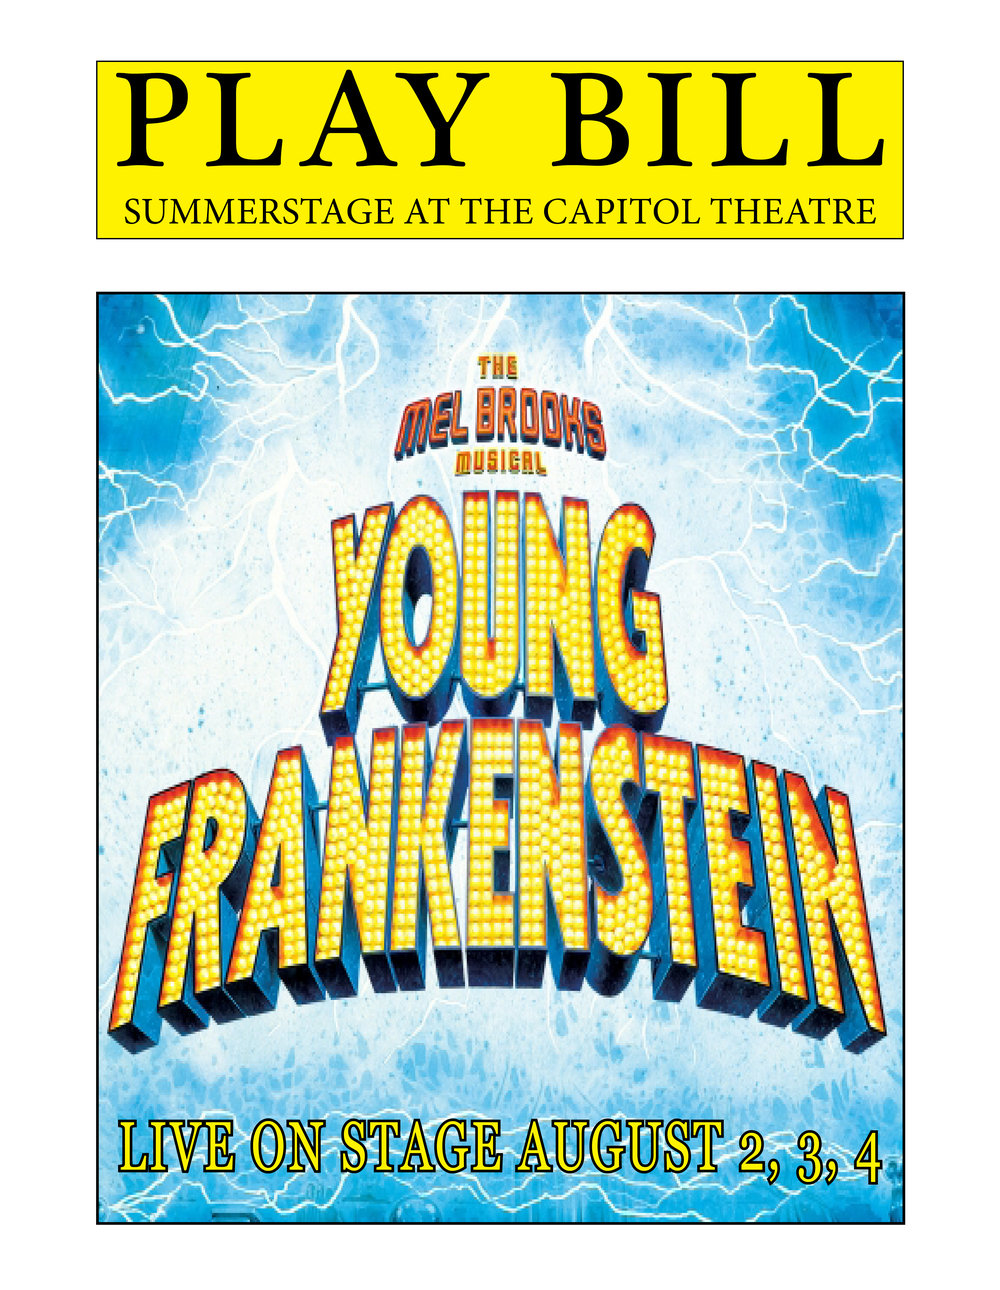 Young Frankenstein Playbill.jpg